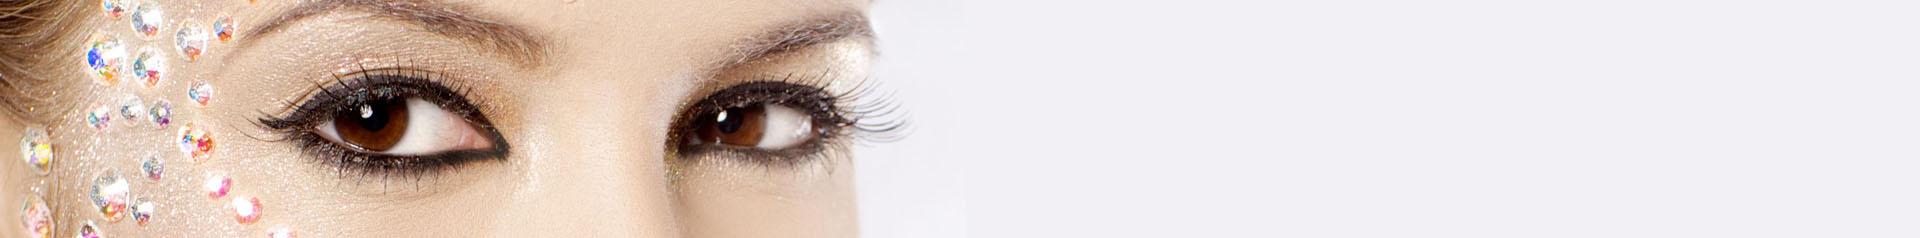 eyebrow tinting service